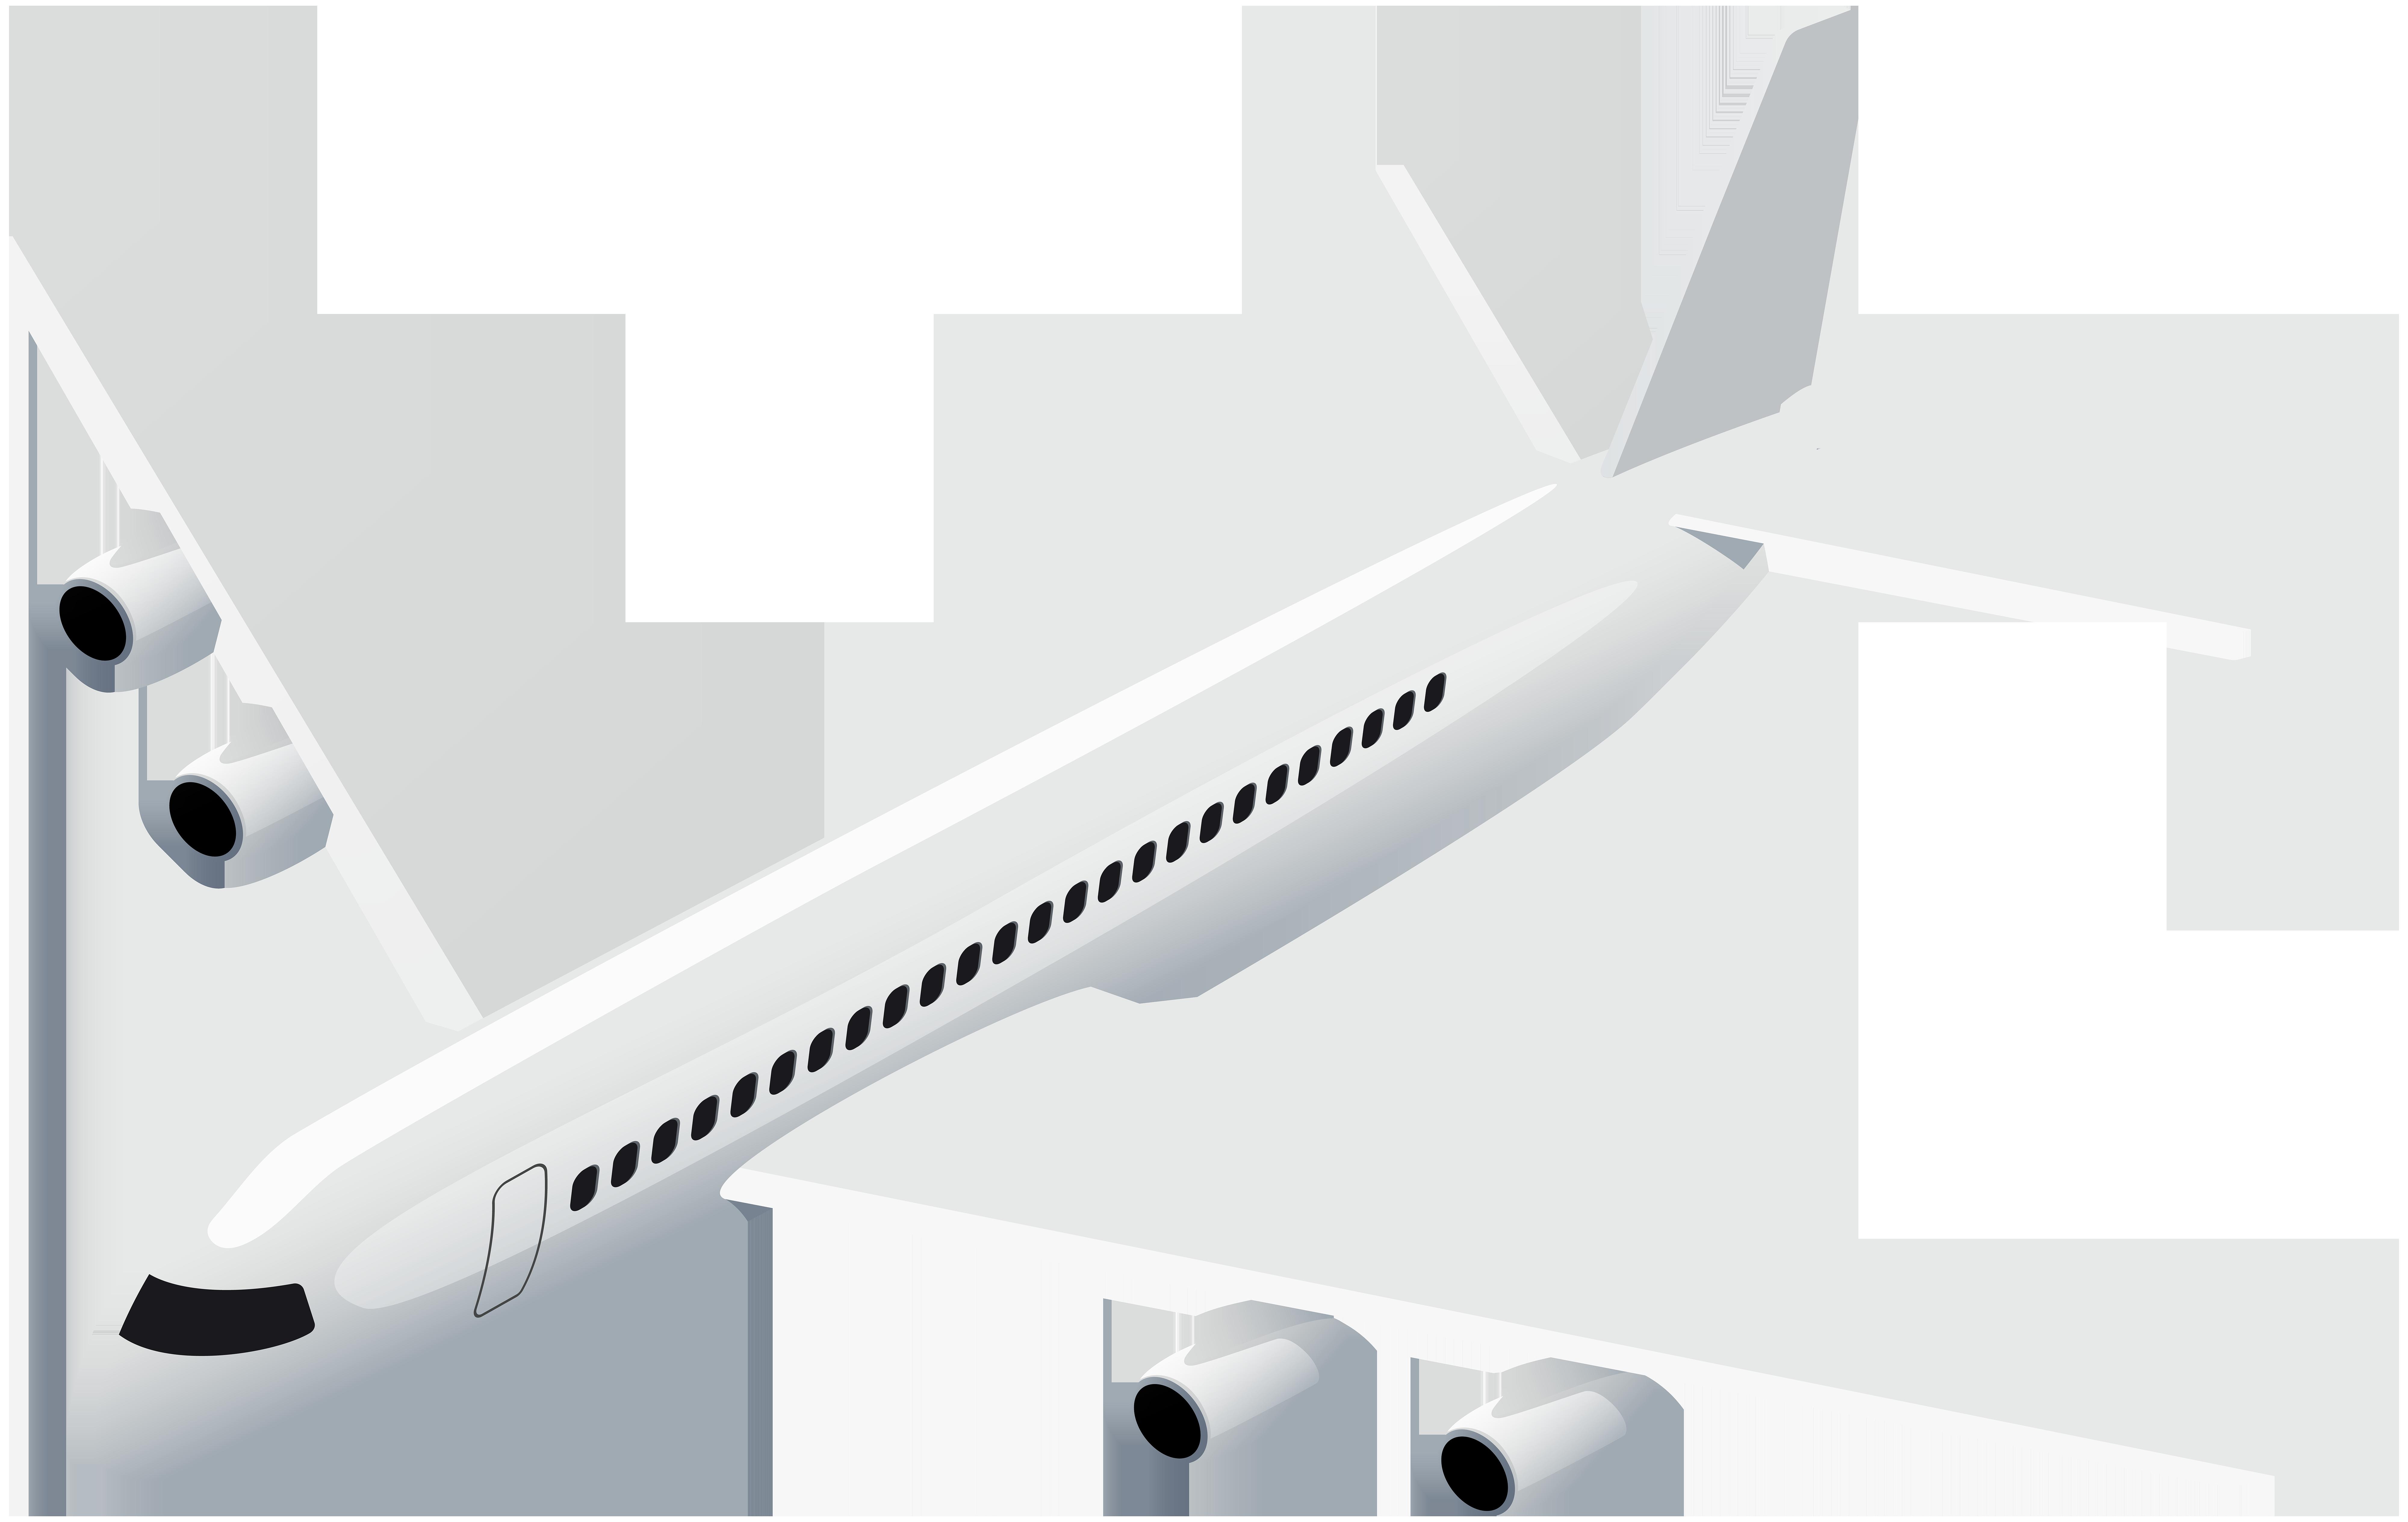 Plane clipart happy birthday. Airplane transparent clip art